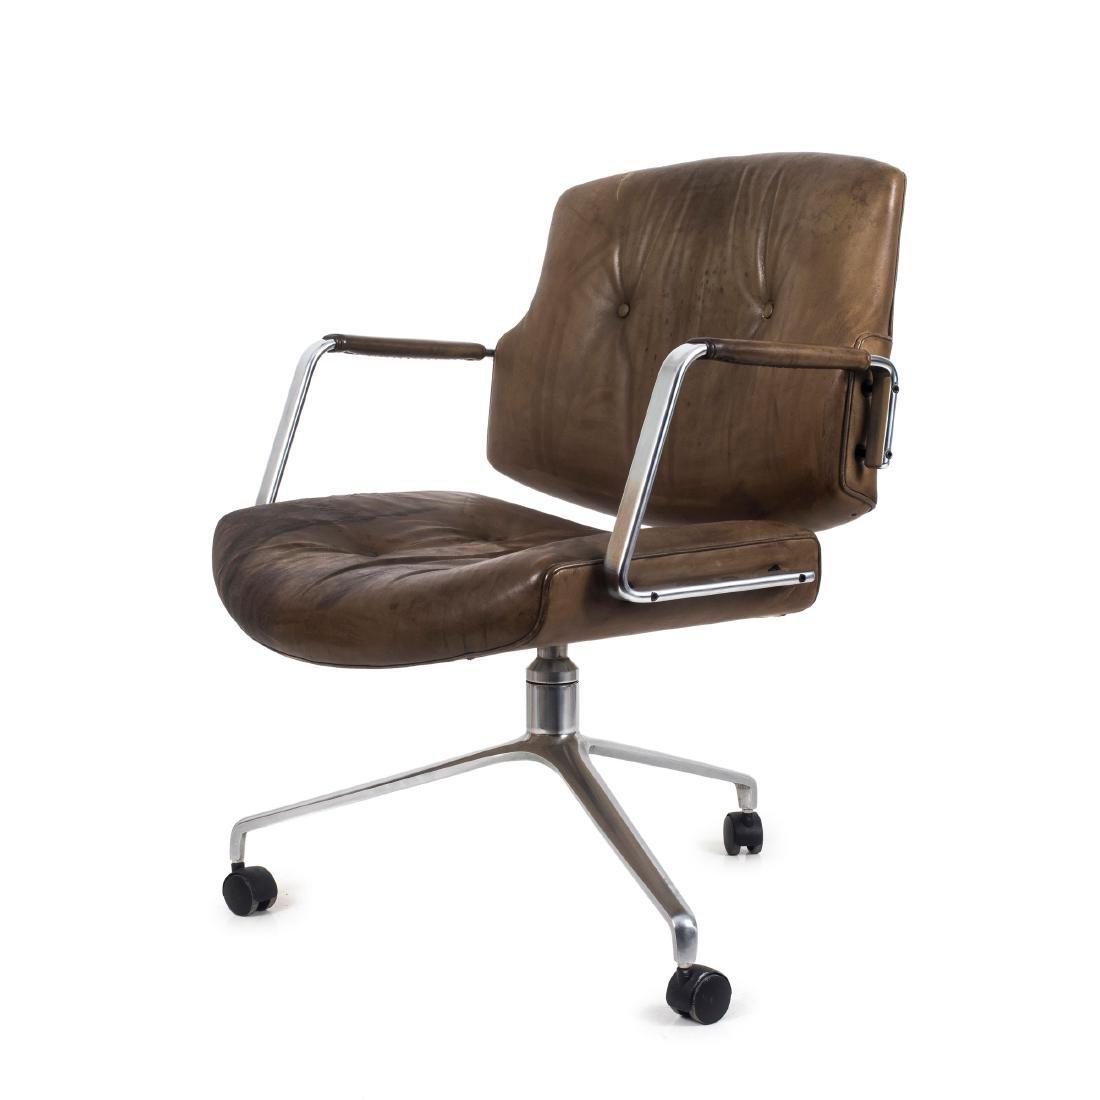 'DK-2' armchair, c. 1965